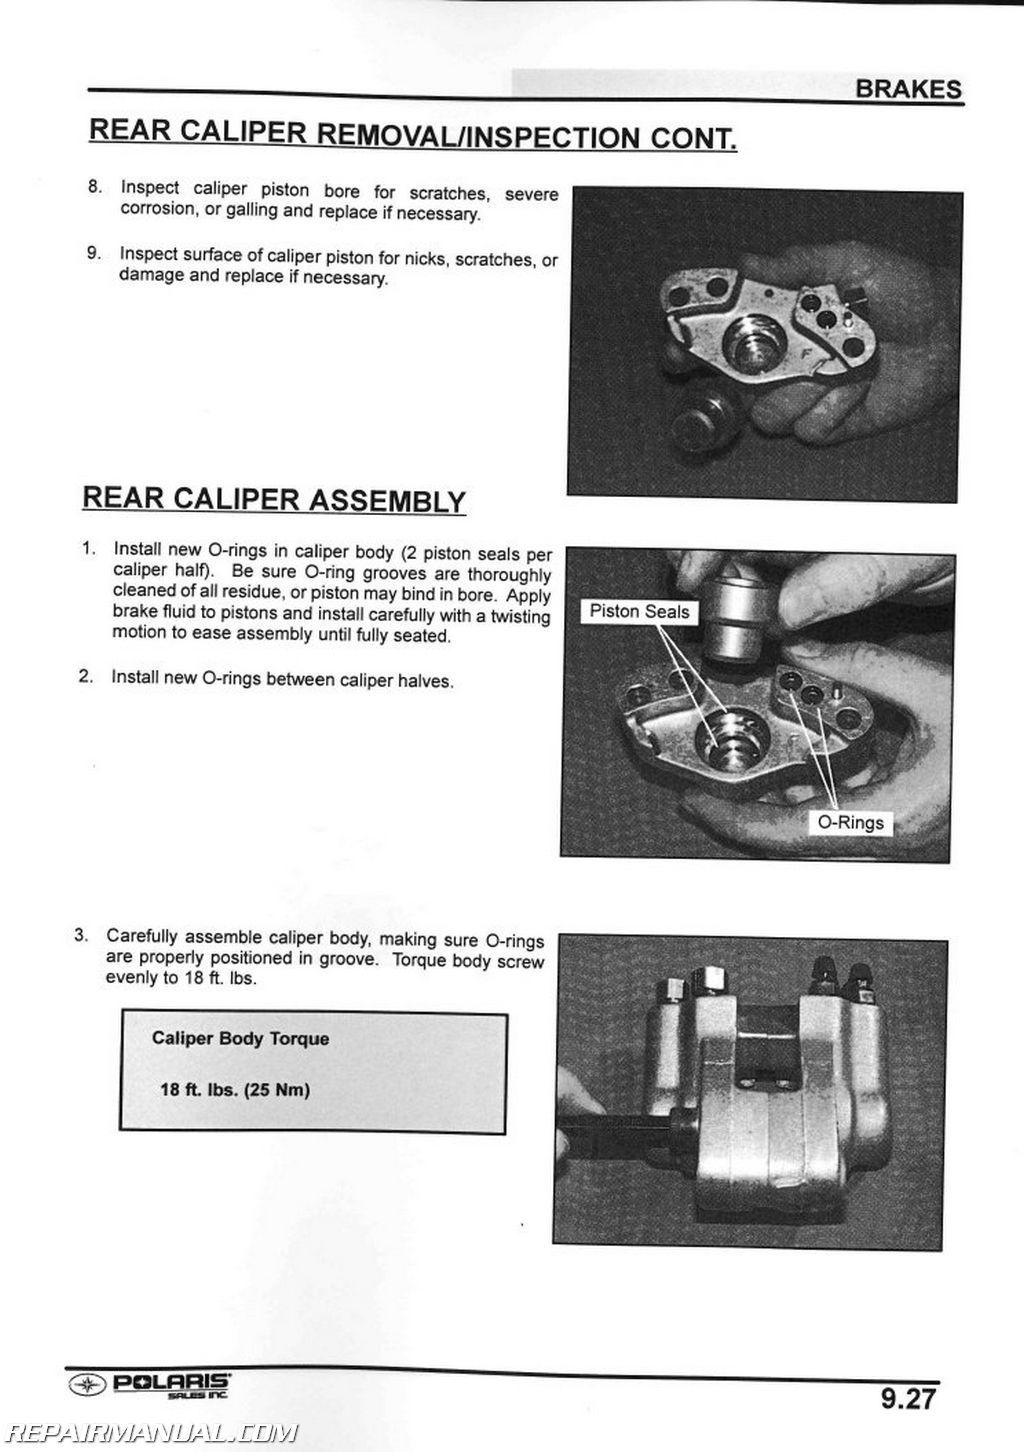 polaris xplorer 400 atv service repair manual 2000